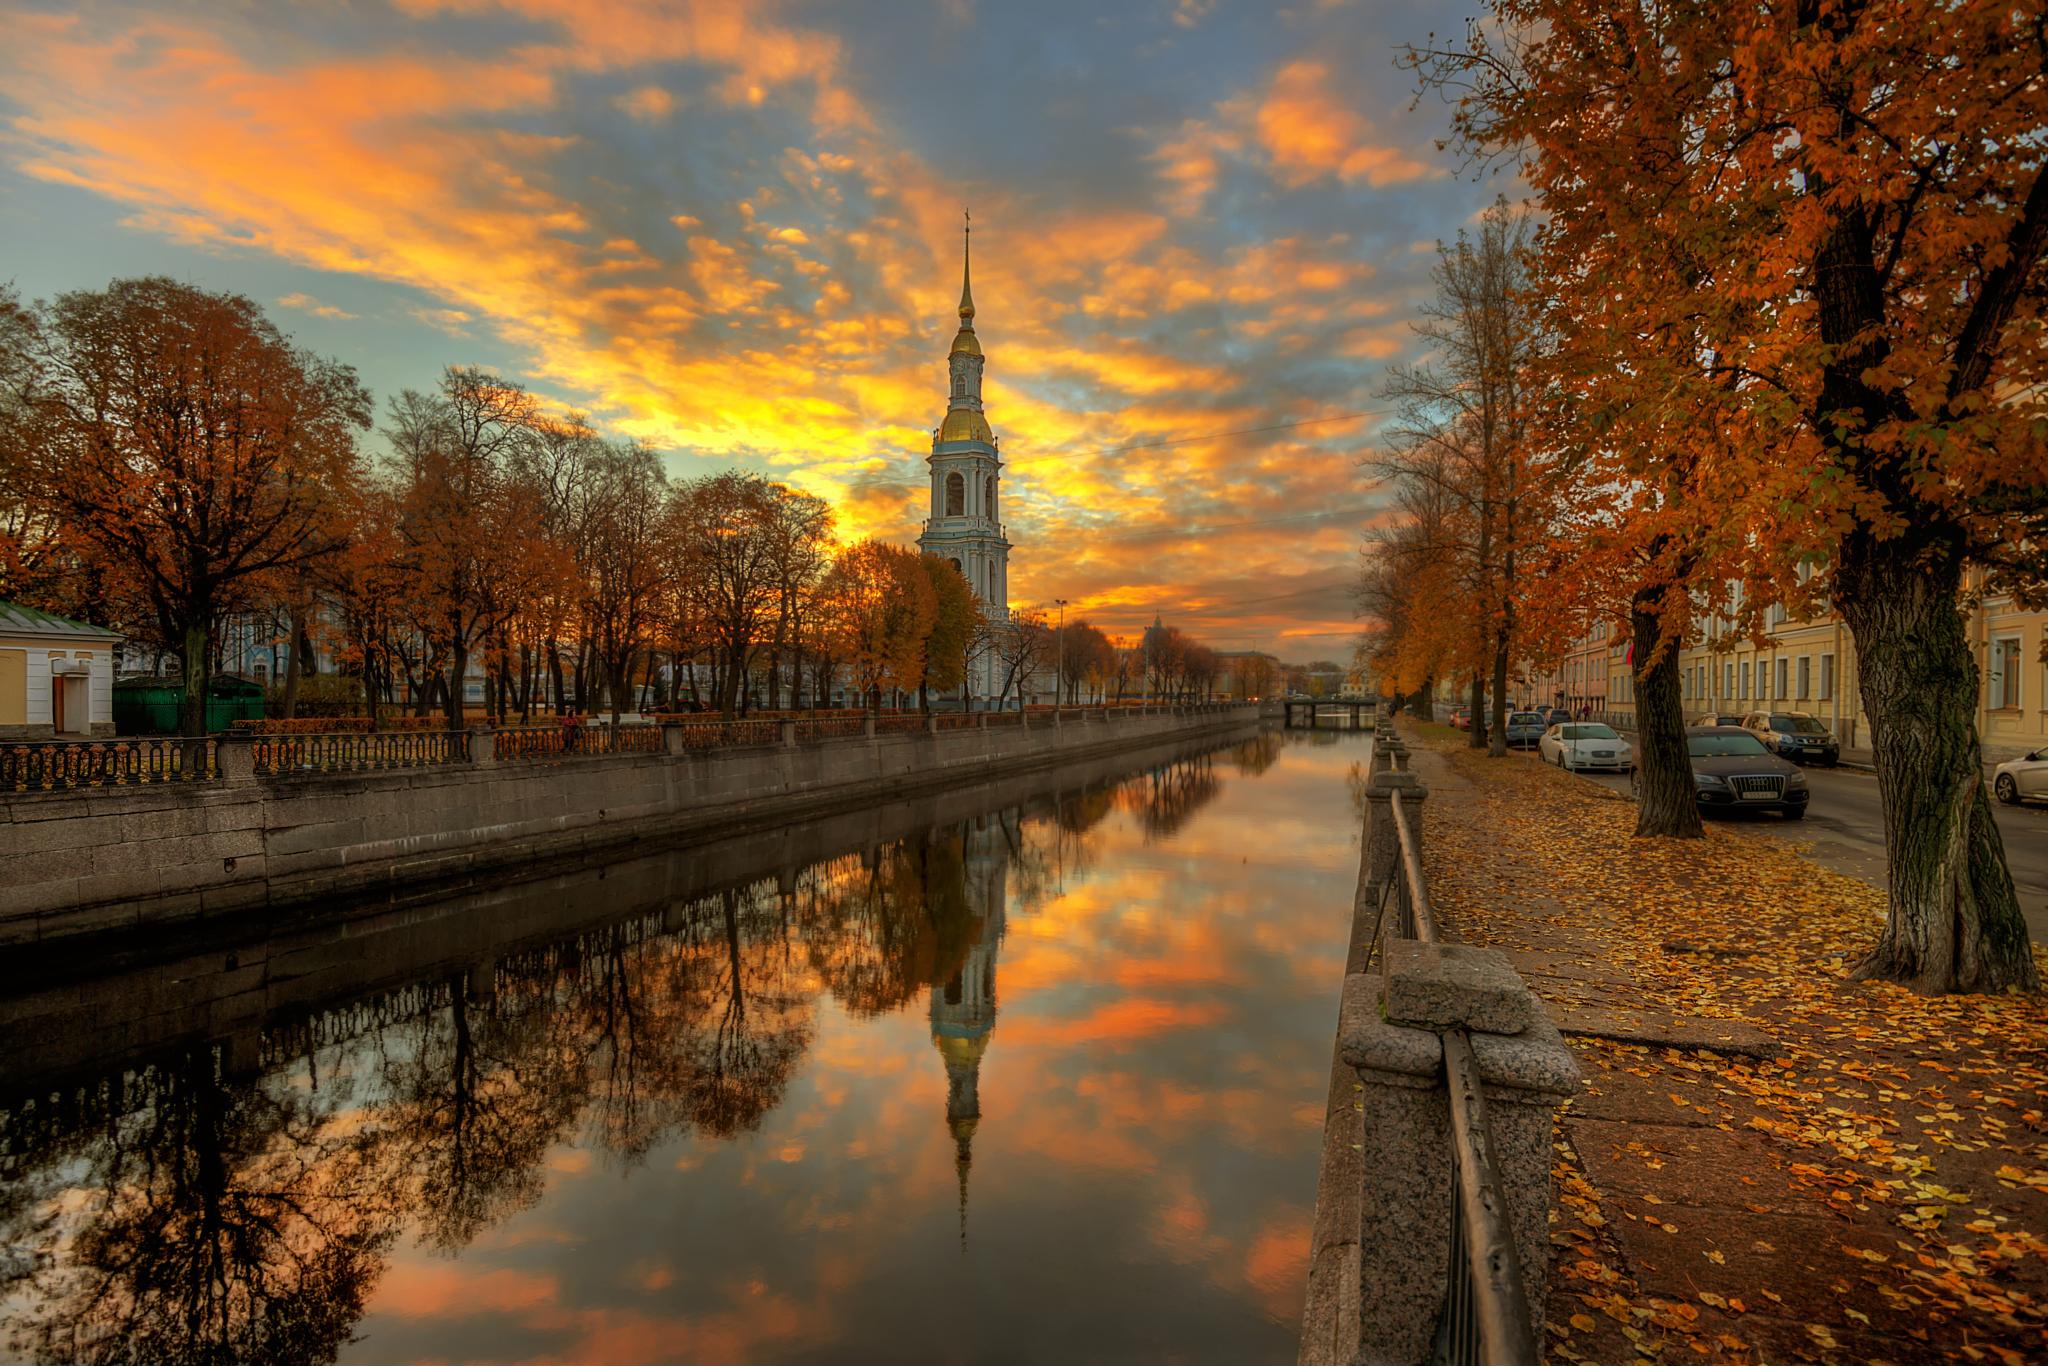 Building Canal Church Man Made Sunset Tree 2048x1366